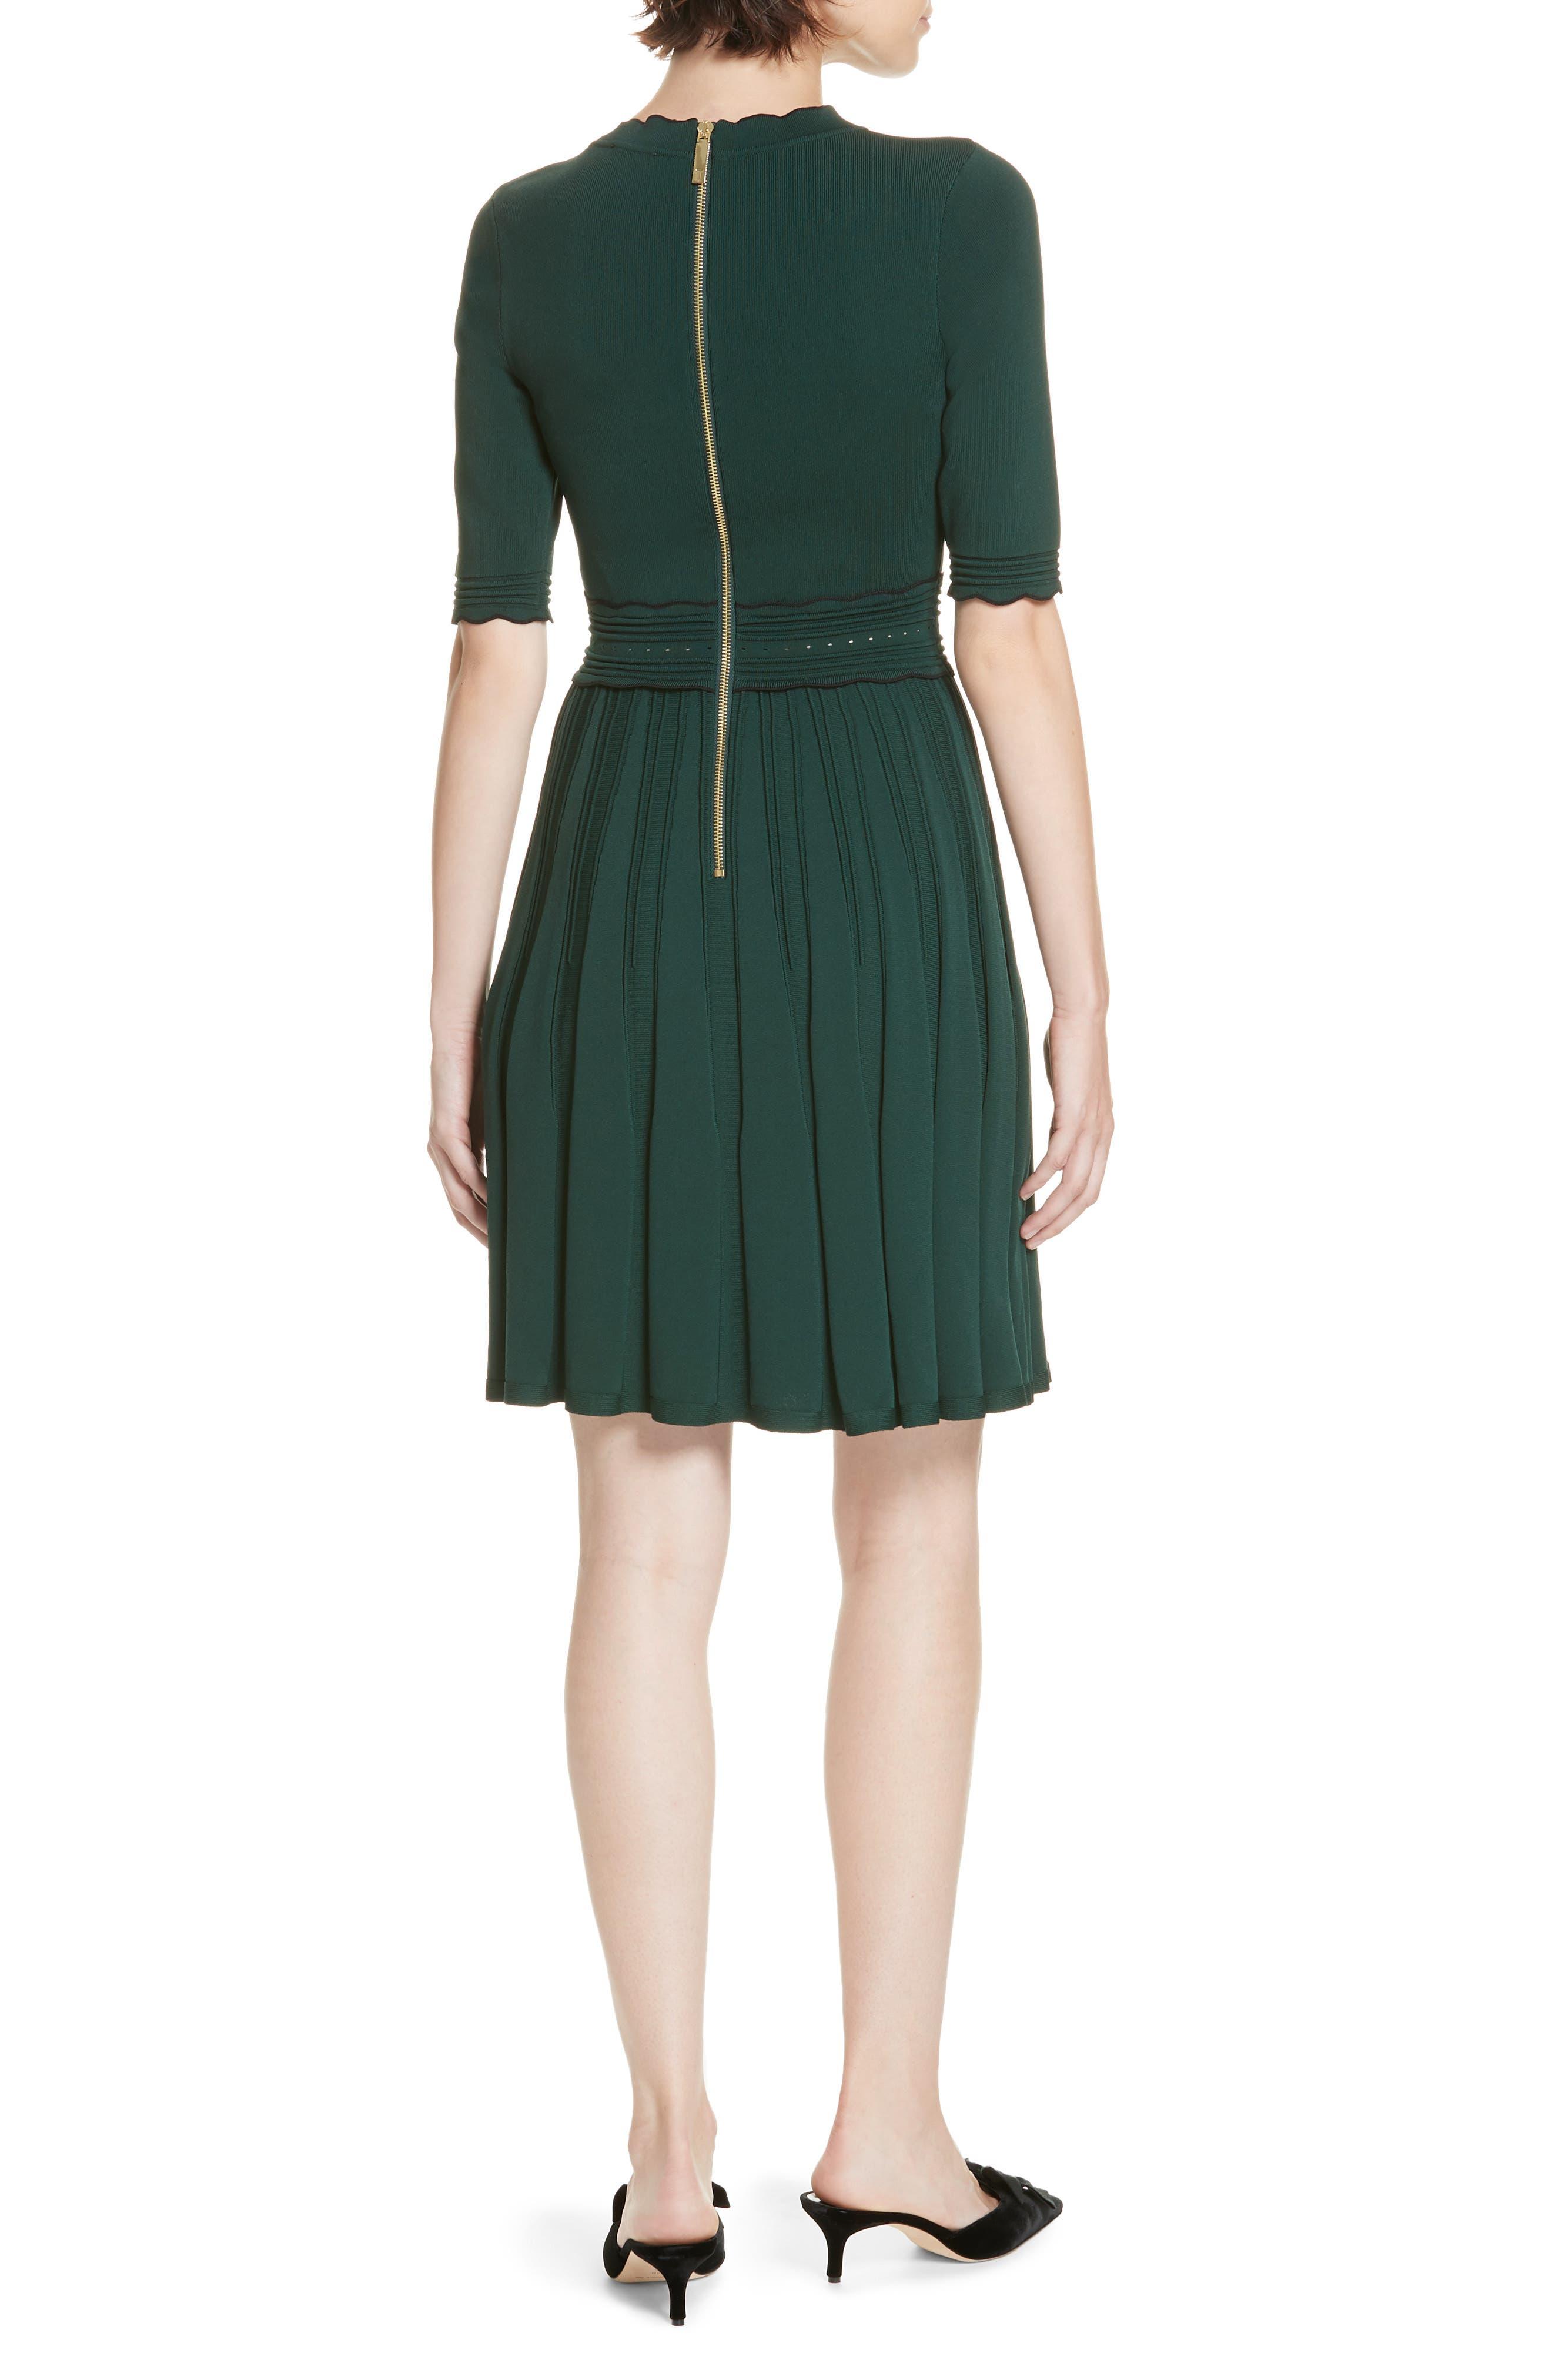 Dorlean Knit Dress,                             Alternate thumbnail 2, color,                             DARK GREEN